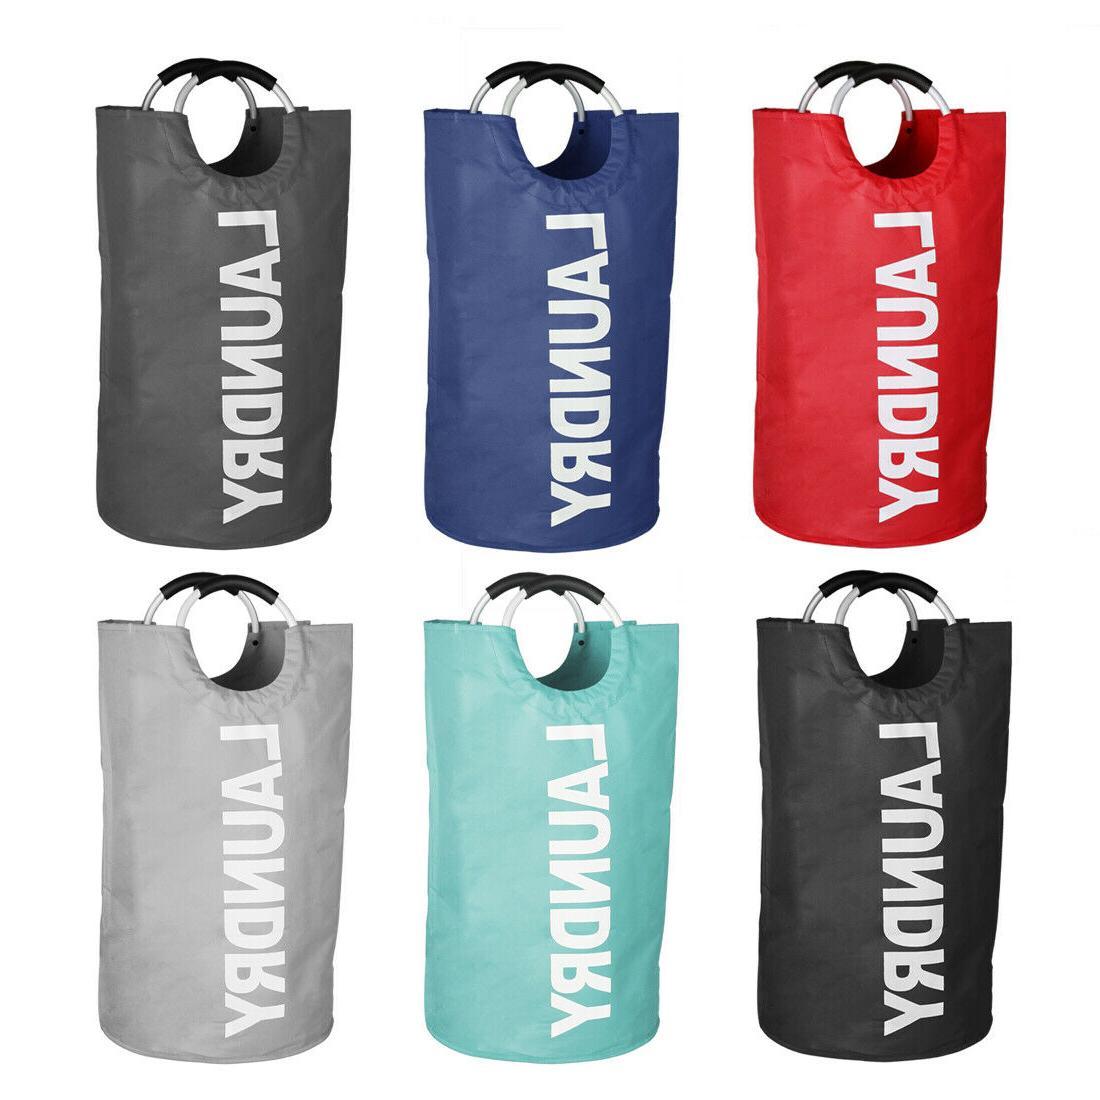 bag waterproof hamper collapsible clothes basket home